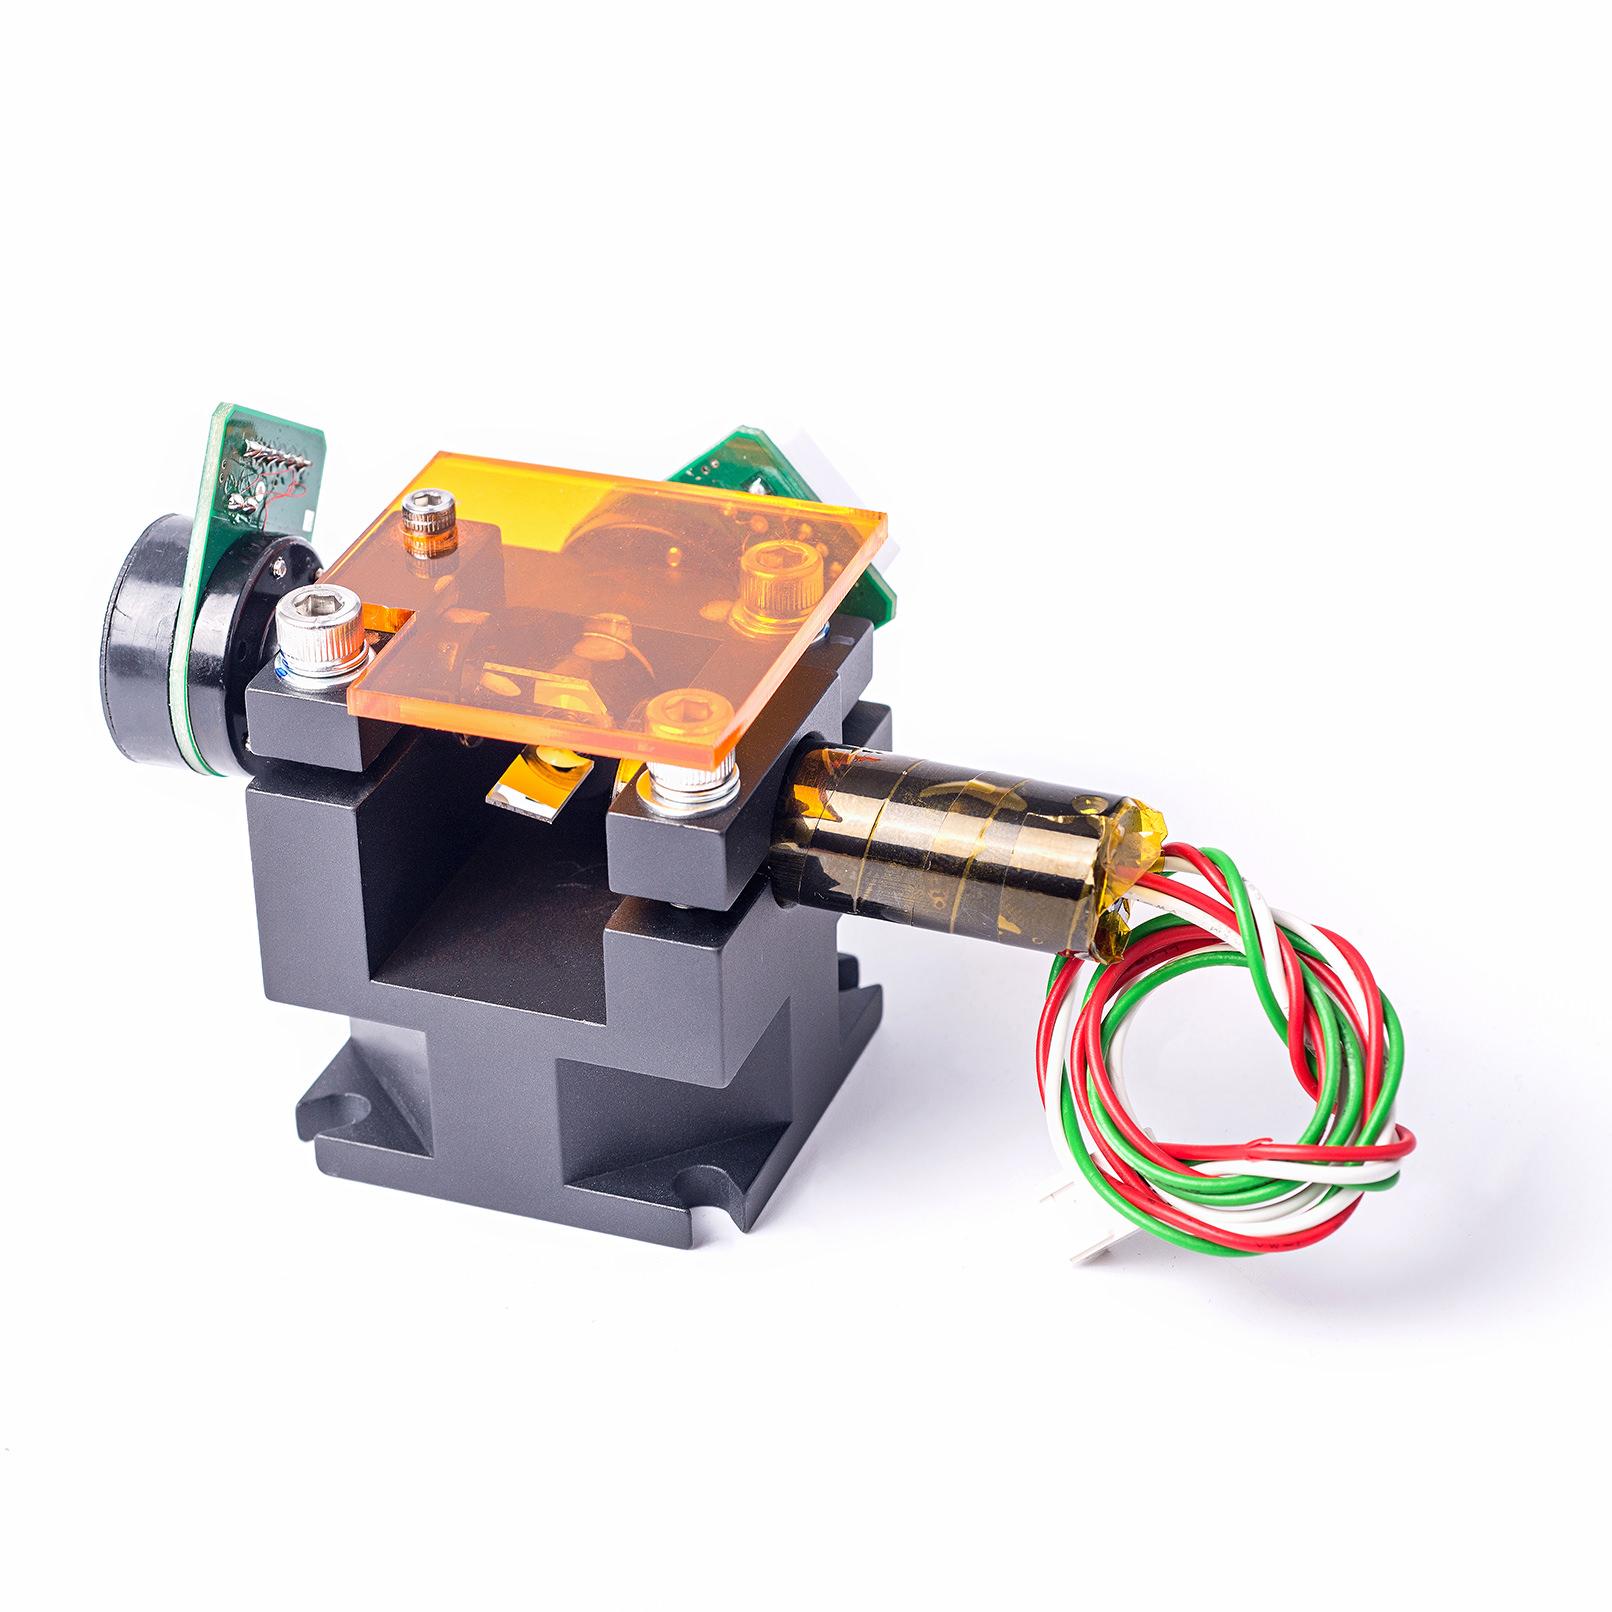 Series3D Dream WorkshopSLA 3D PrinterDIY_mini